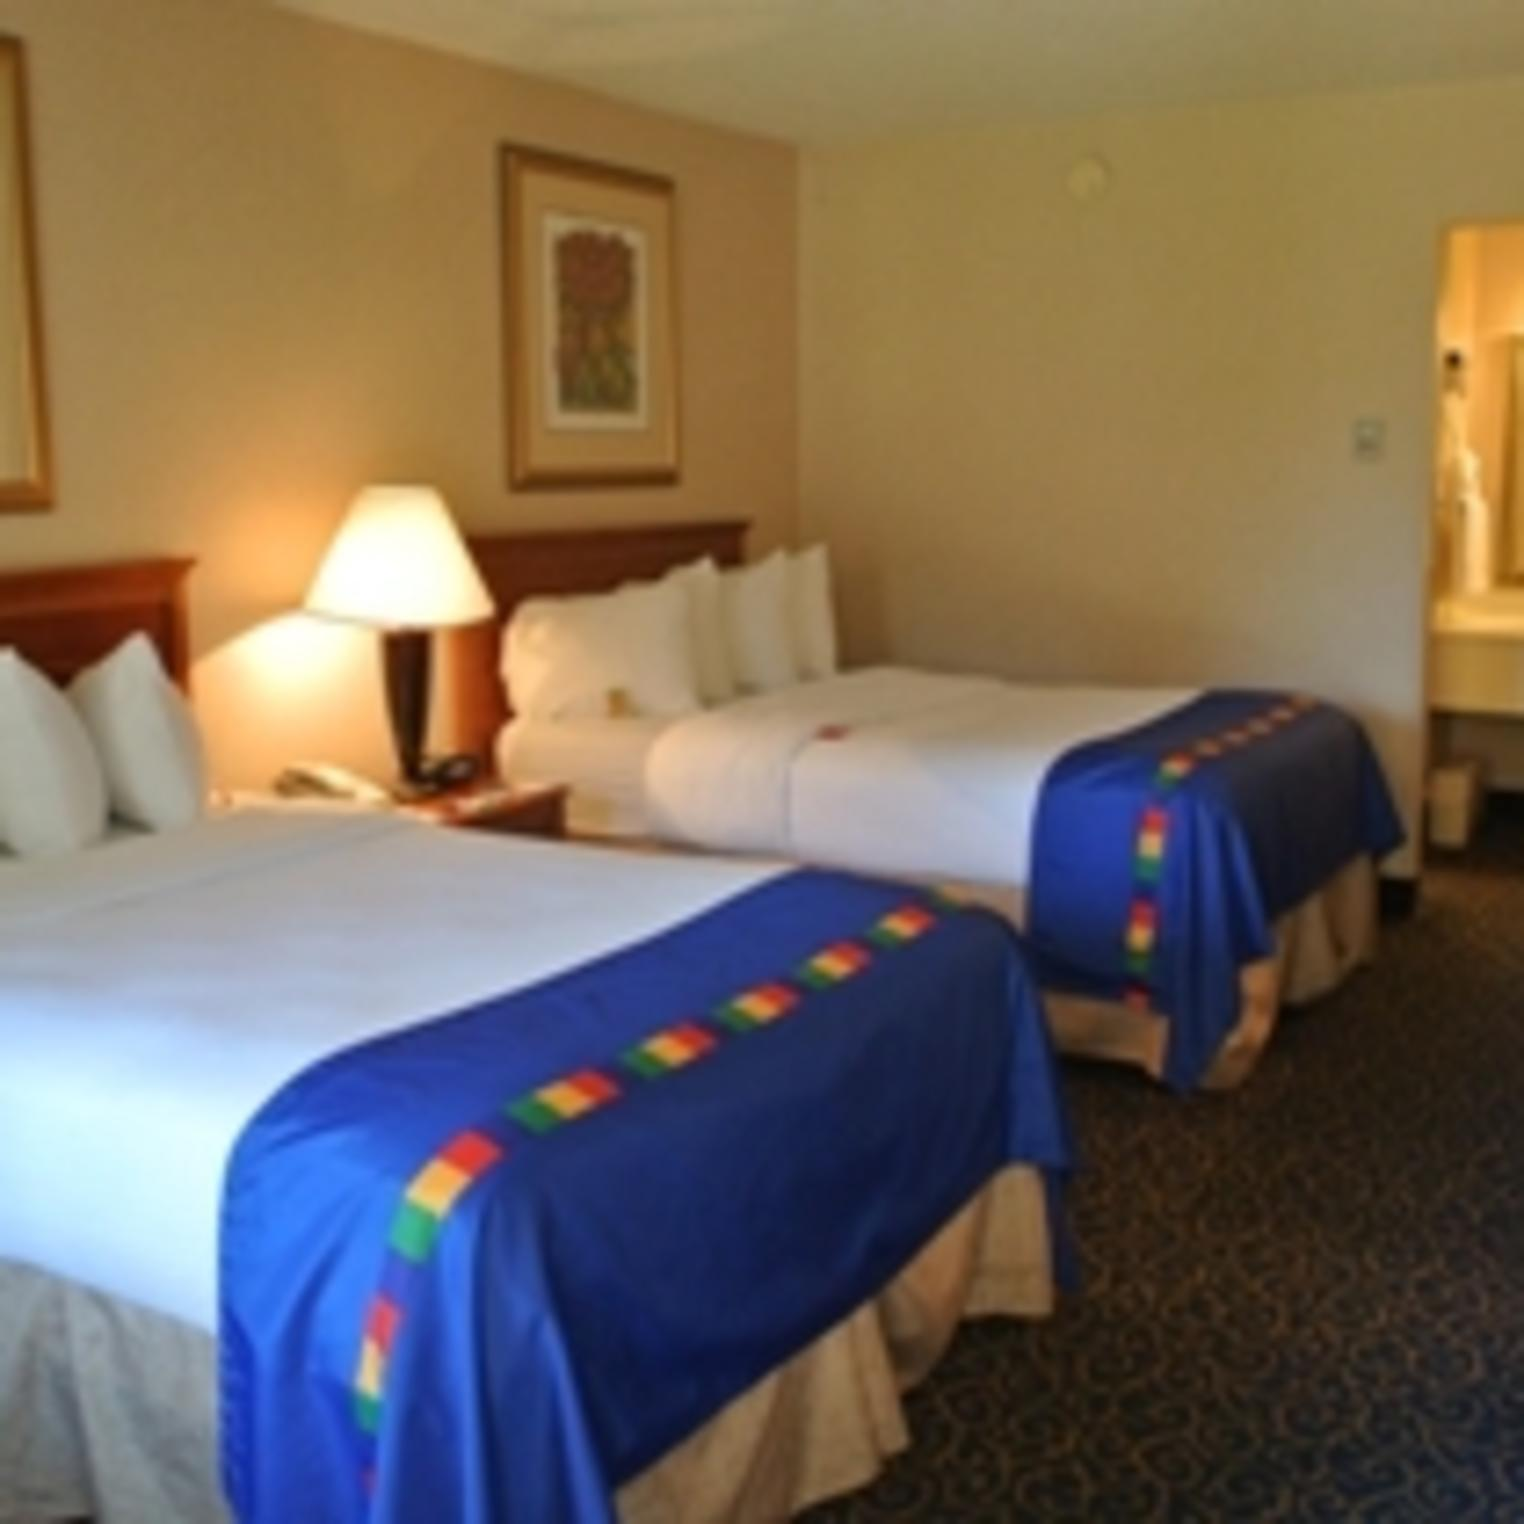 Double bedded sleeping room